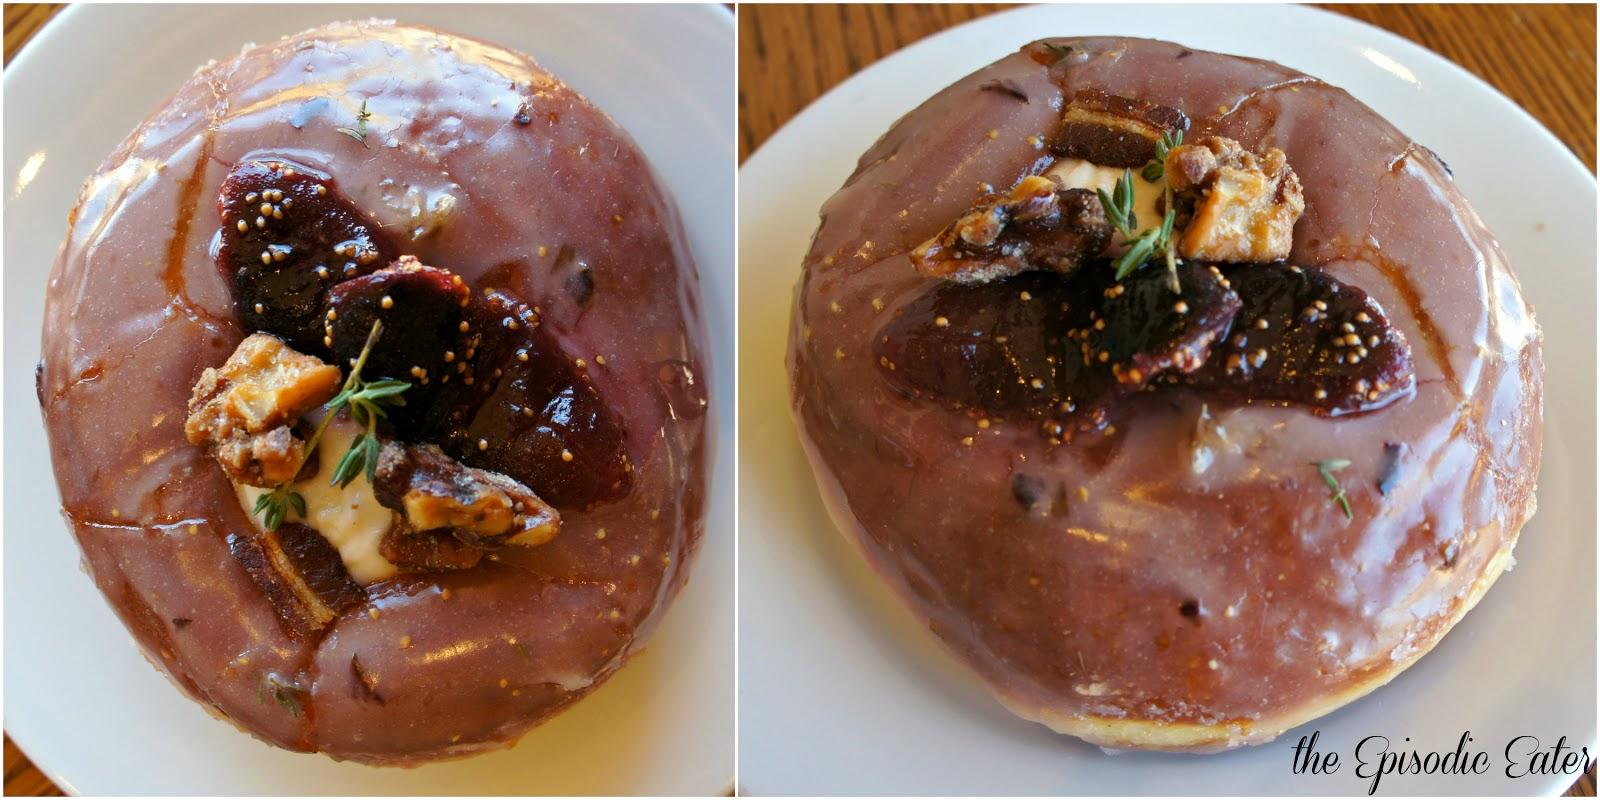 Sidecar Doughnuts (Costa Mesa, CA) on The Episodic Eater